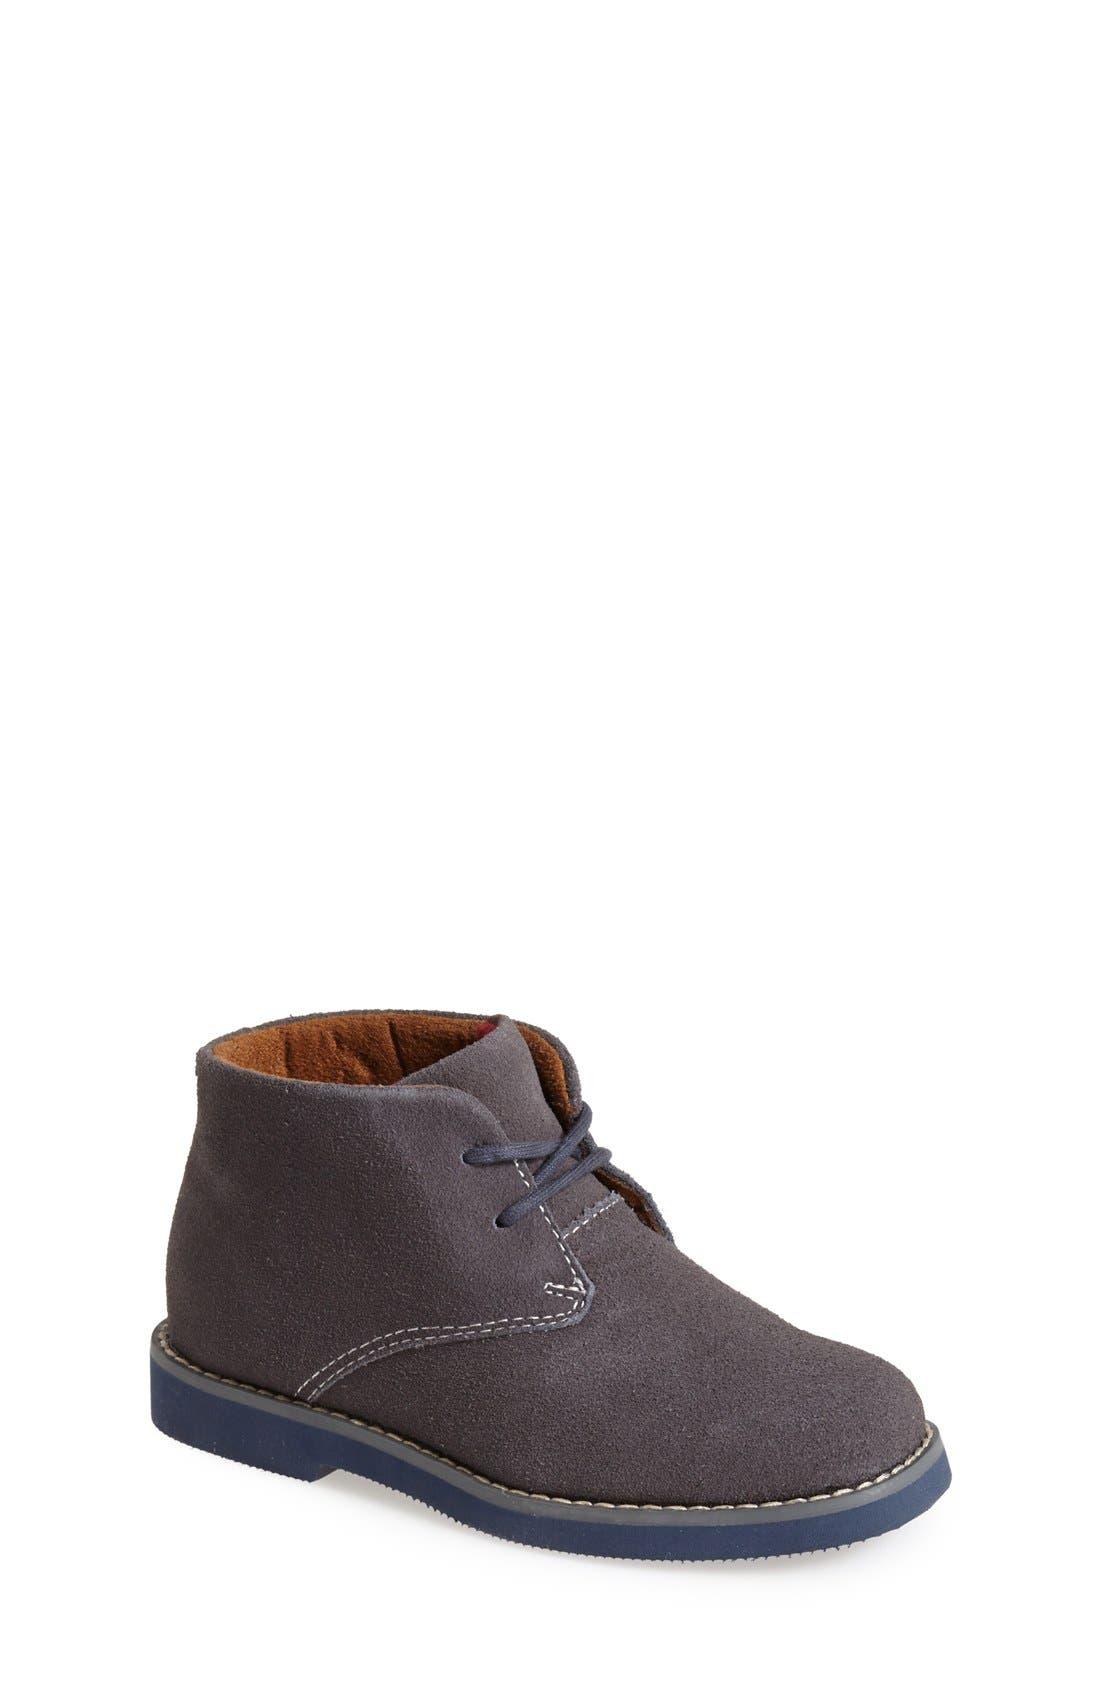 'Quinlan' Chukka Boot,                         Main,                         color, Grey/ Navy Sole